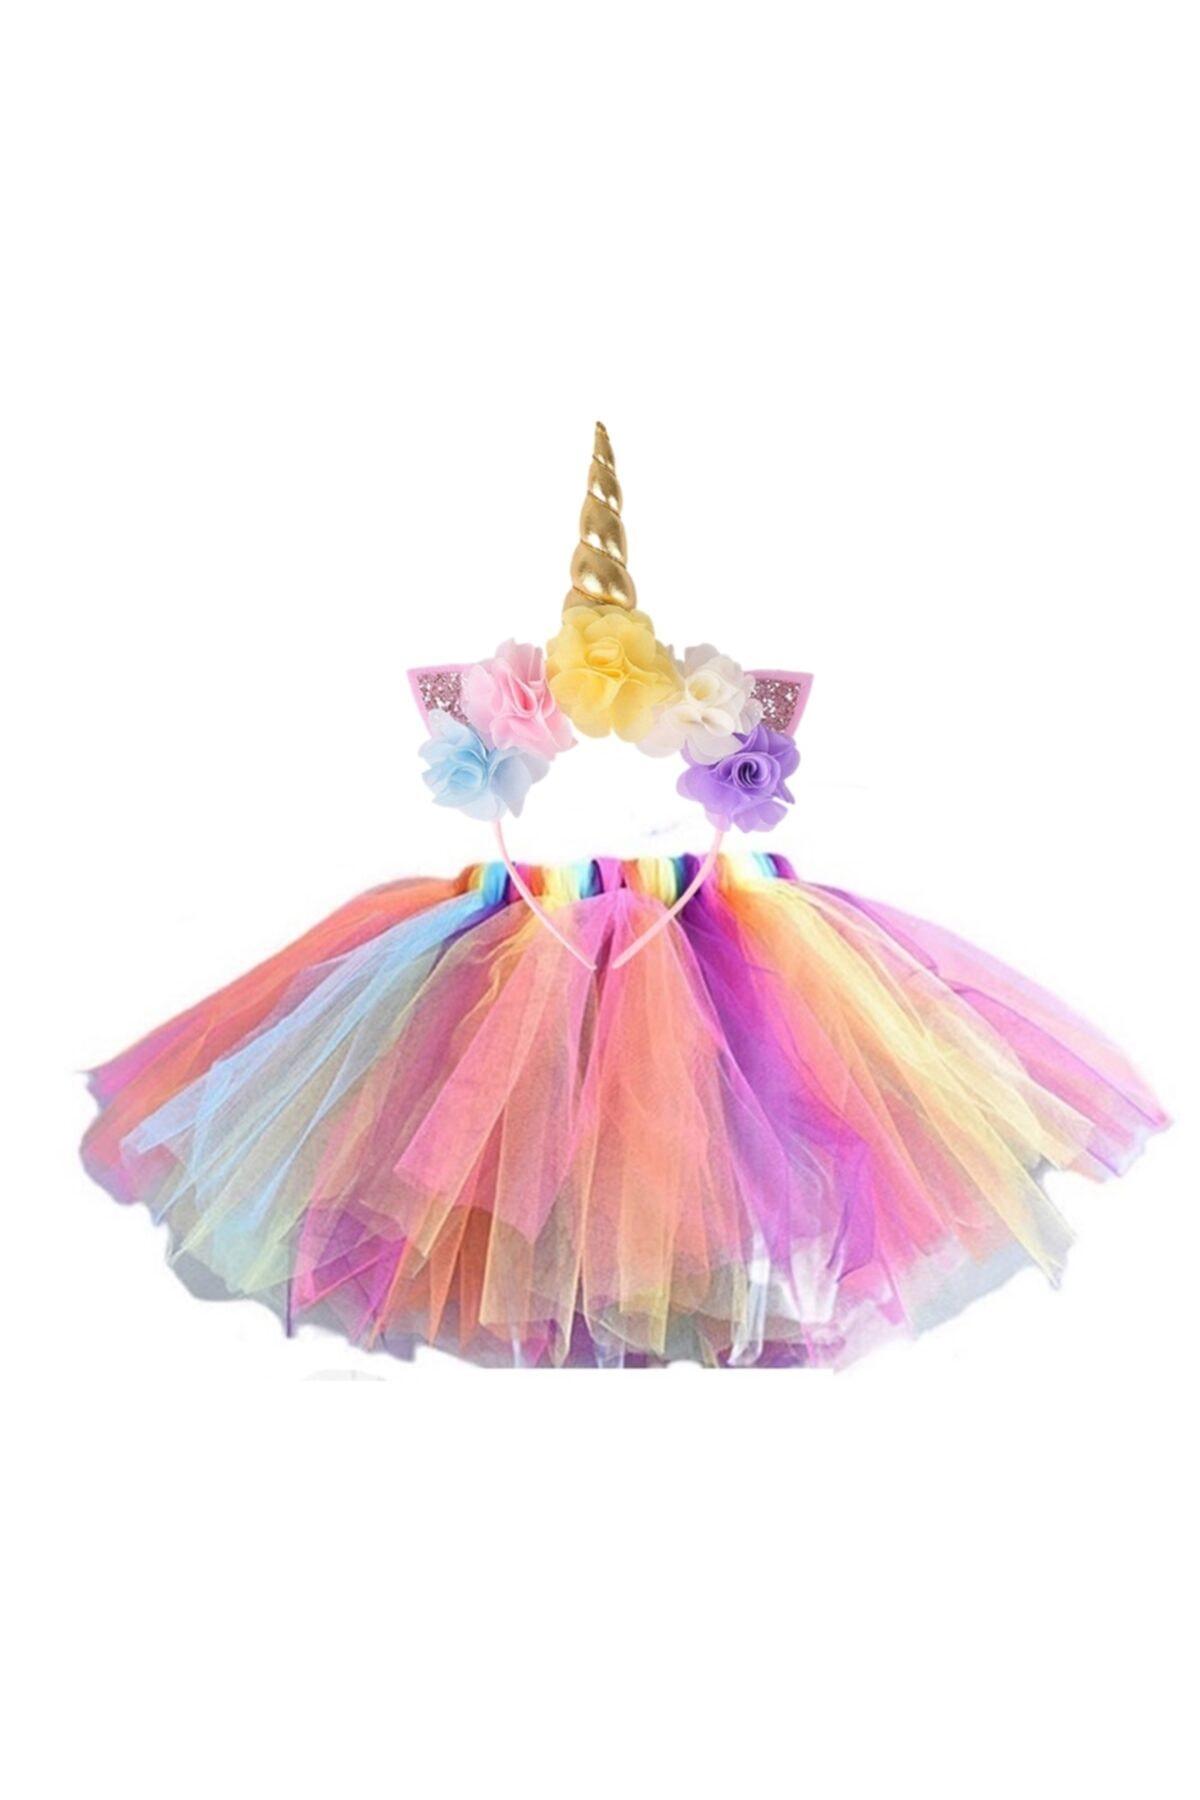 bba new trend Unicorn Taç Tütü Etek Seti.doğum Günü Parti Kostüm 2 Liset 1